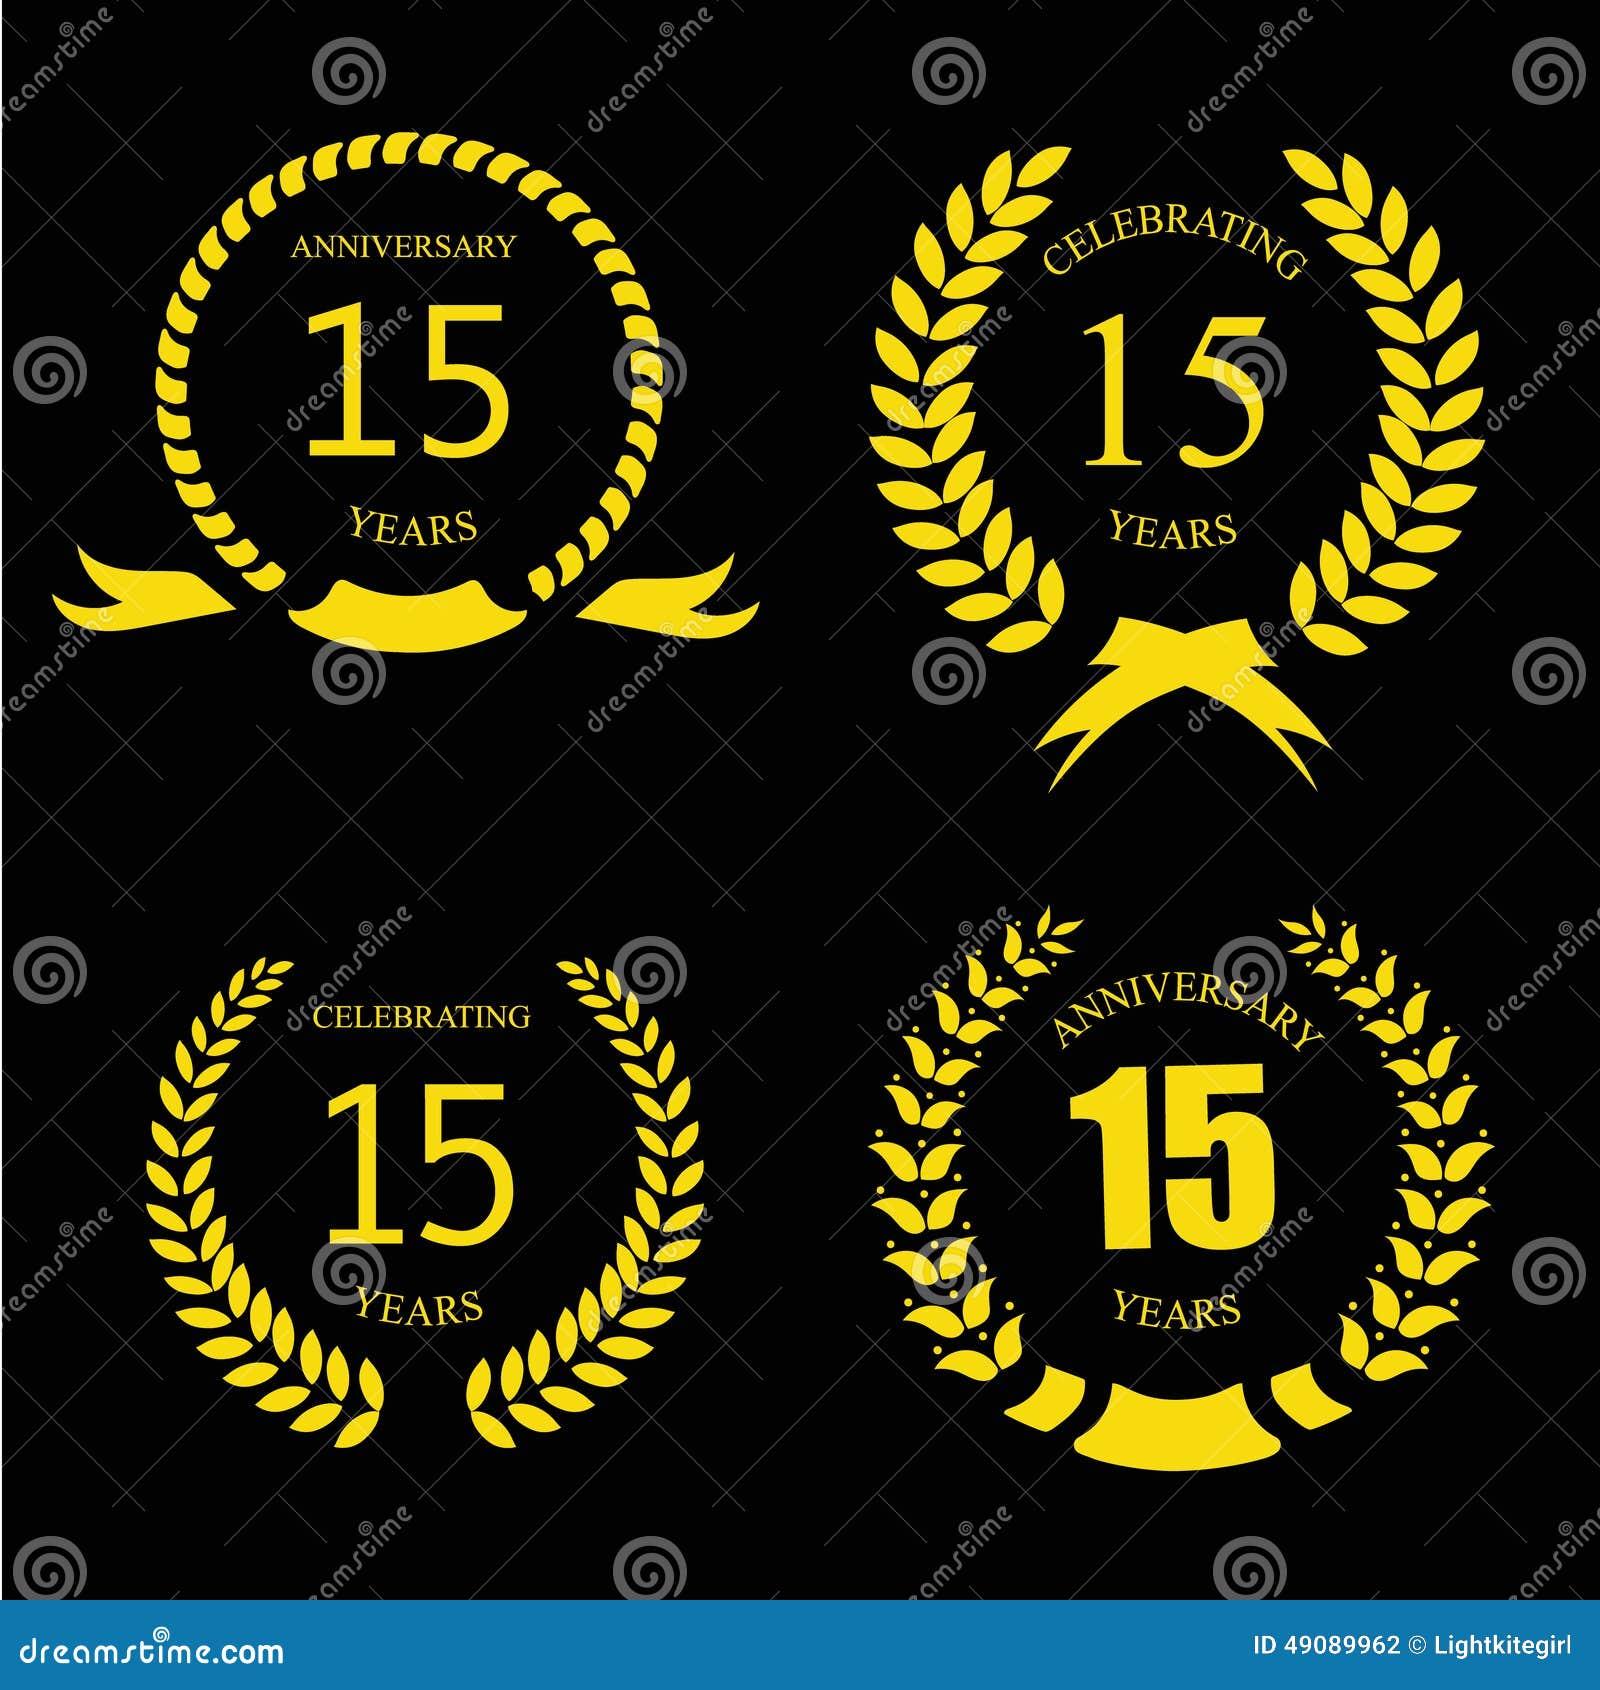 Celebrating 15 Years Anniversary - Golden Laurel Stock ...